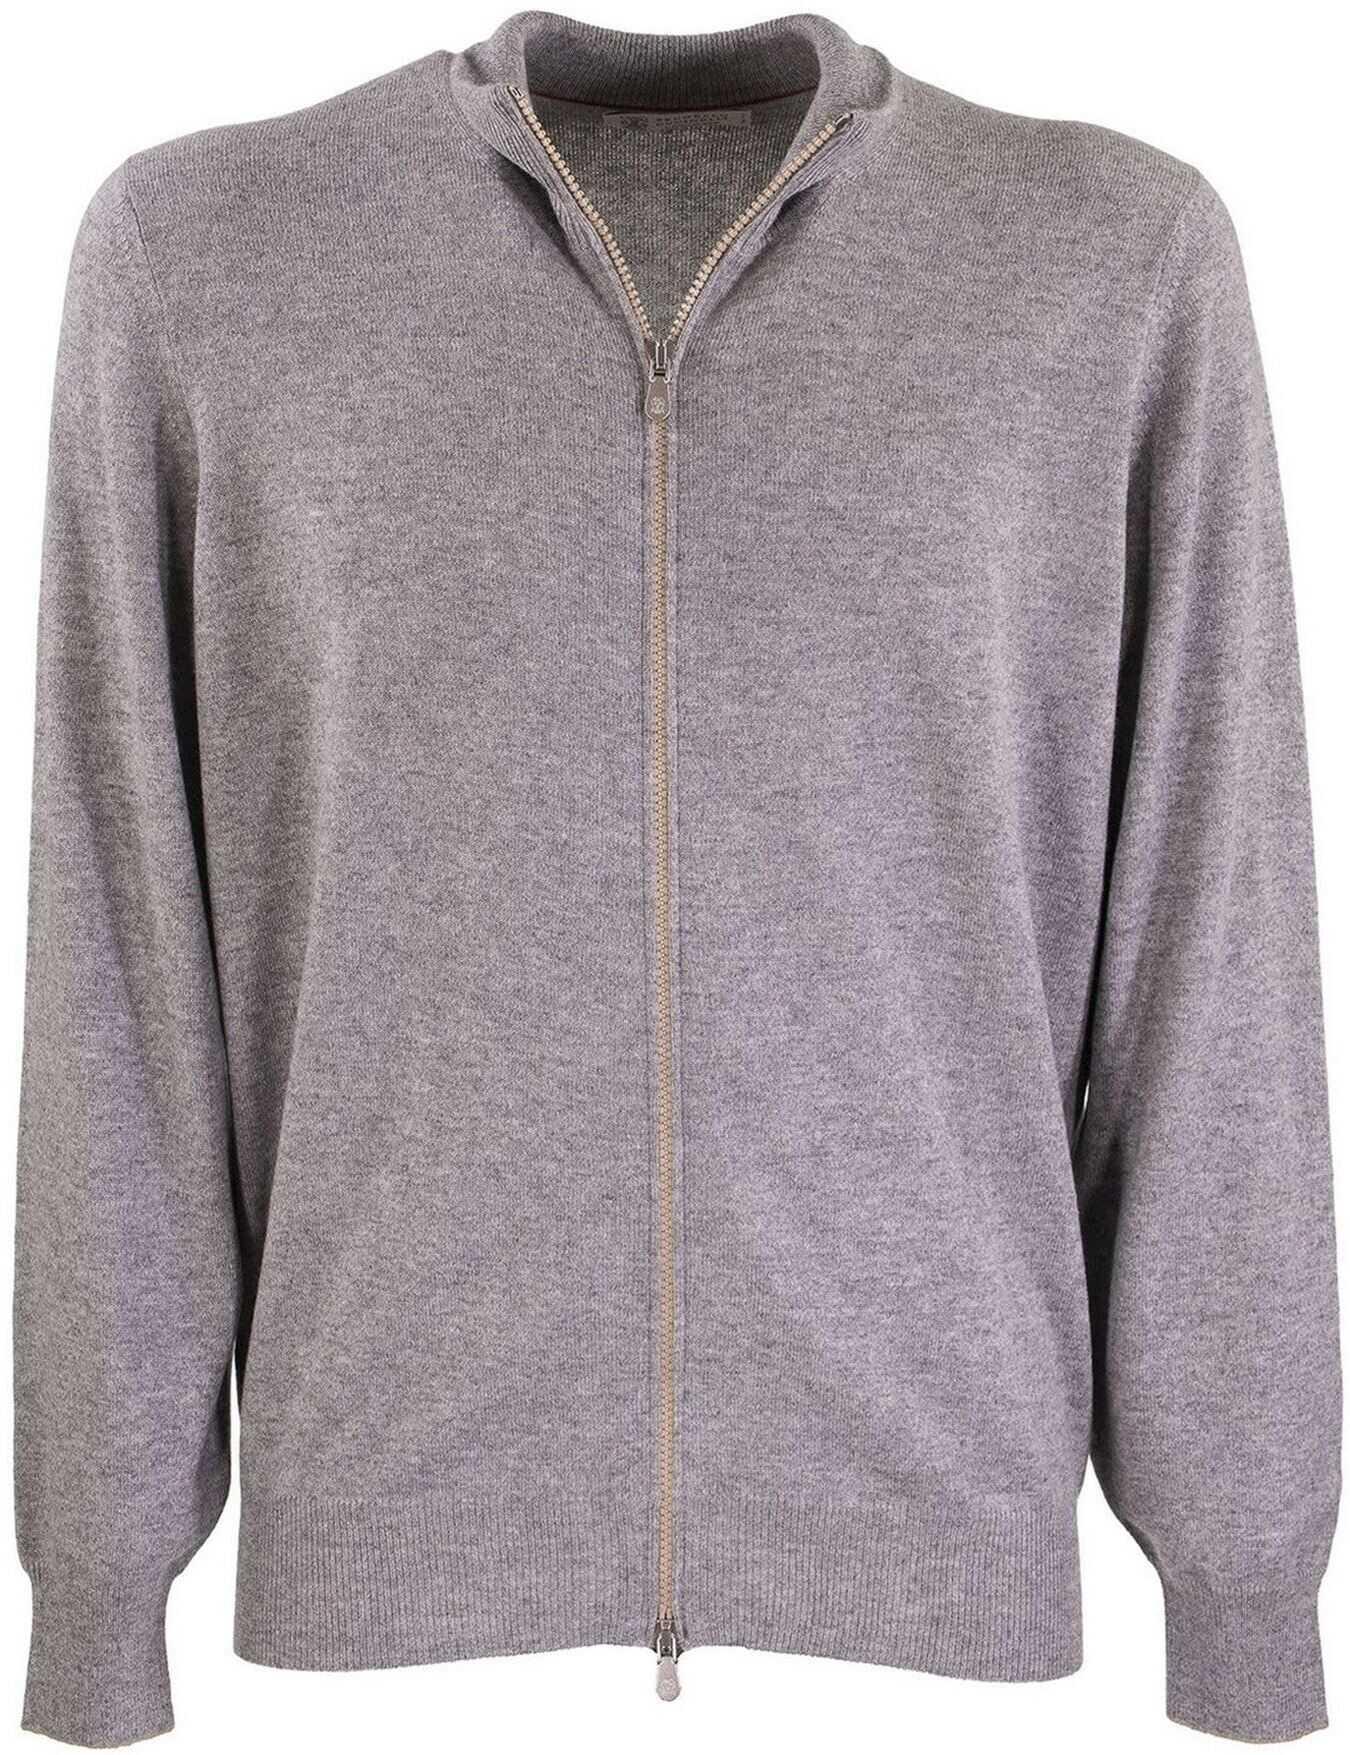 Brunello Cucinelli Grey Cashmere Cardigan With High Collar Grey imagine